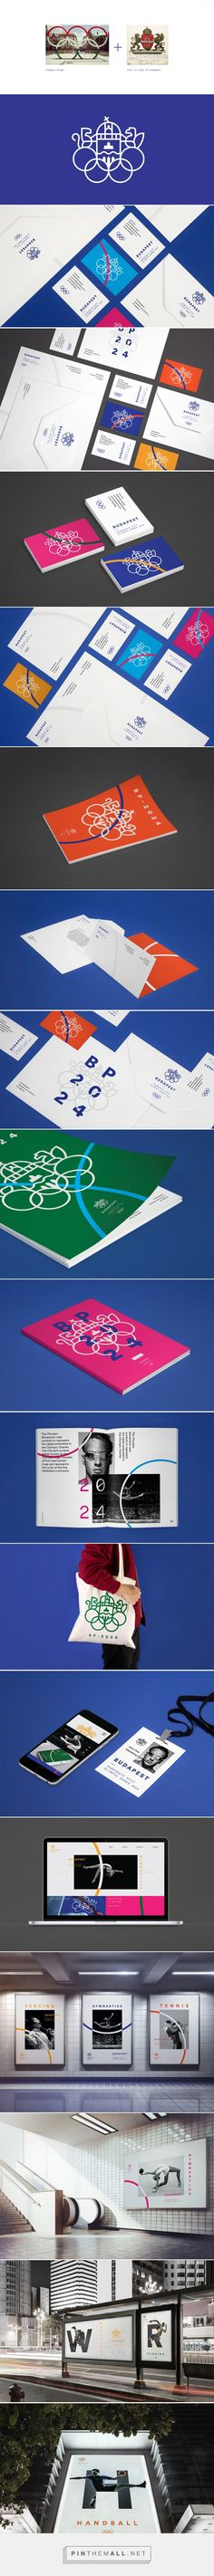 BP2024 Budapest - Branding | Abduzeedo Design Inspiration - created via https://pinthemall.net